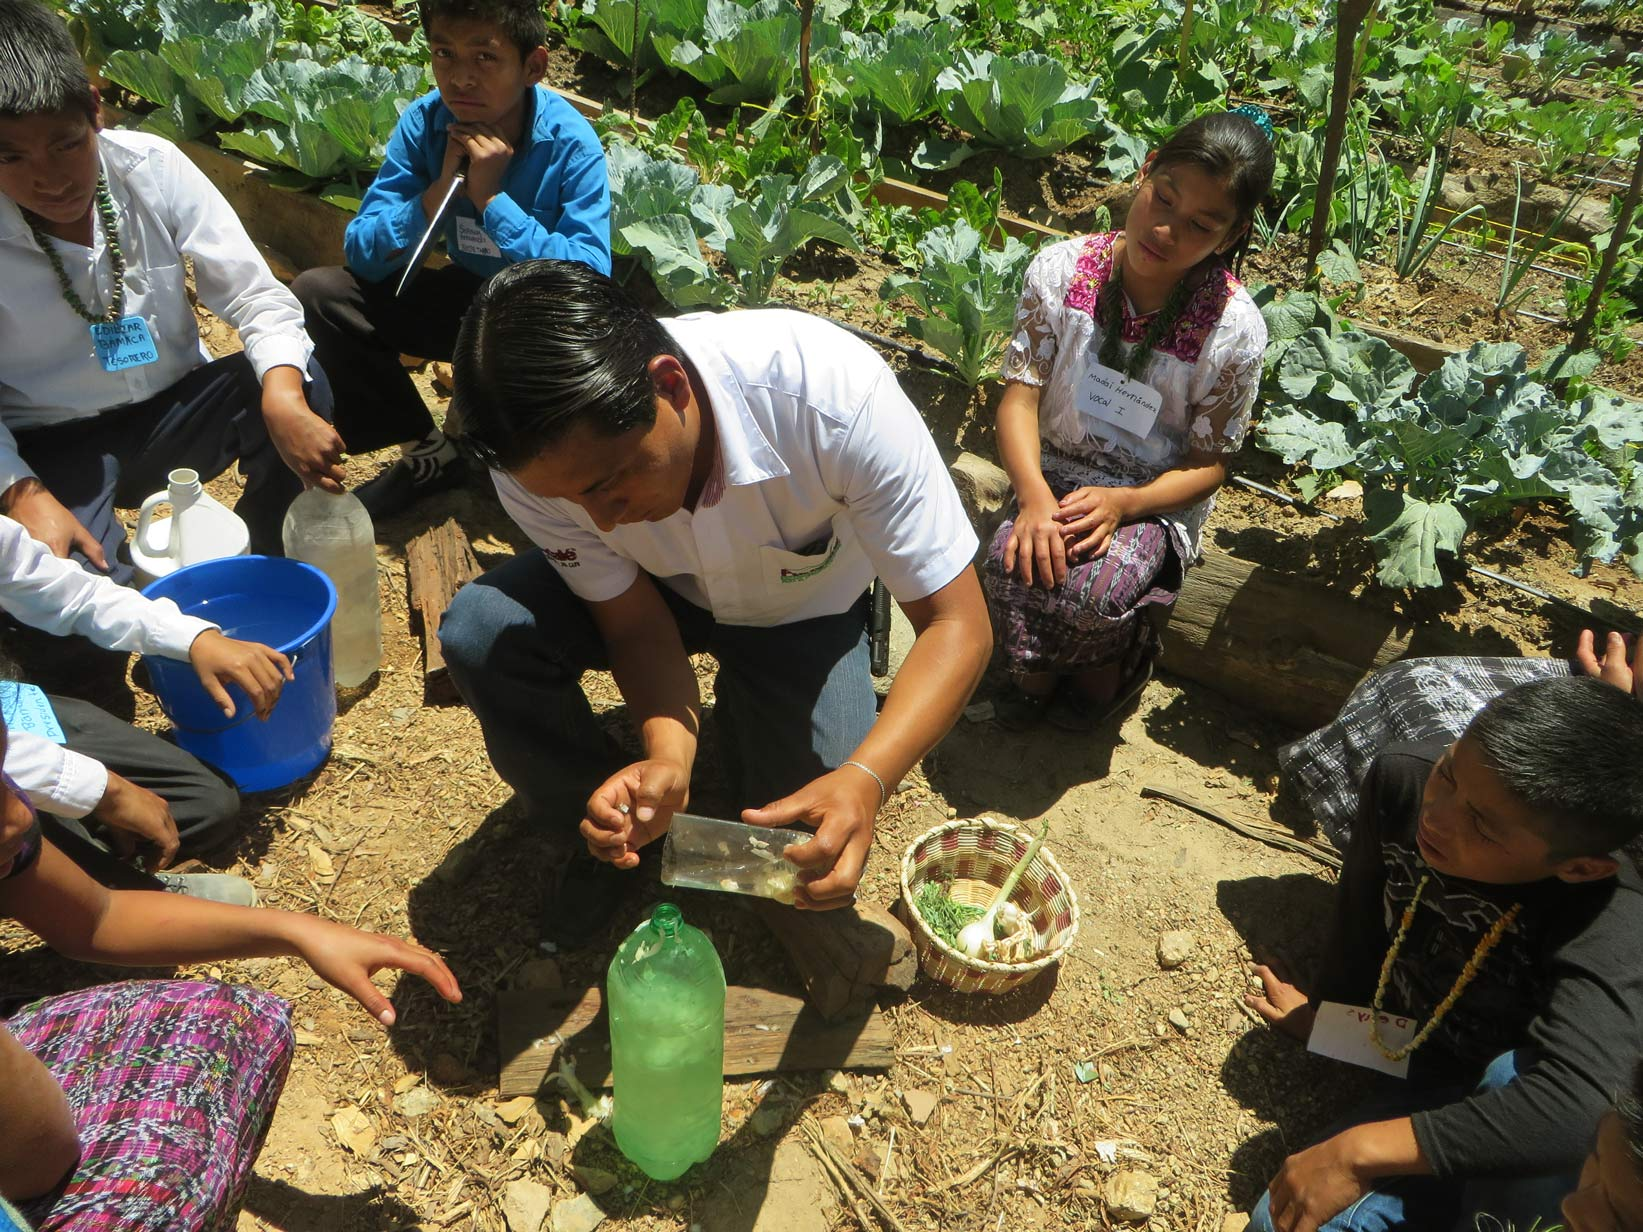 Guatemala-Huertos escolares